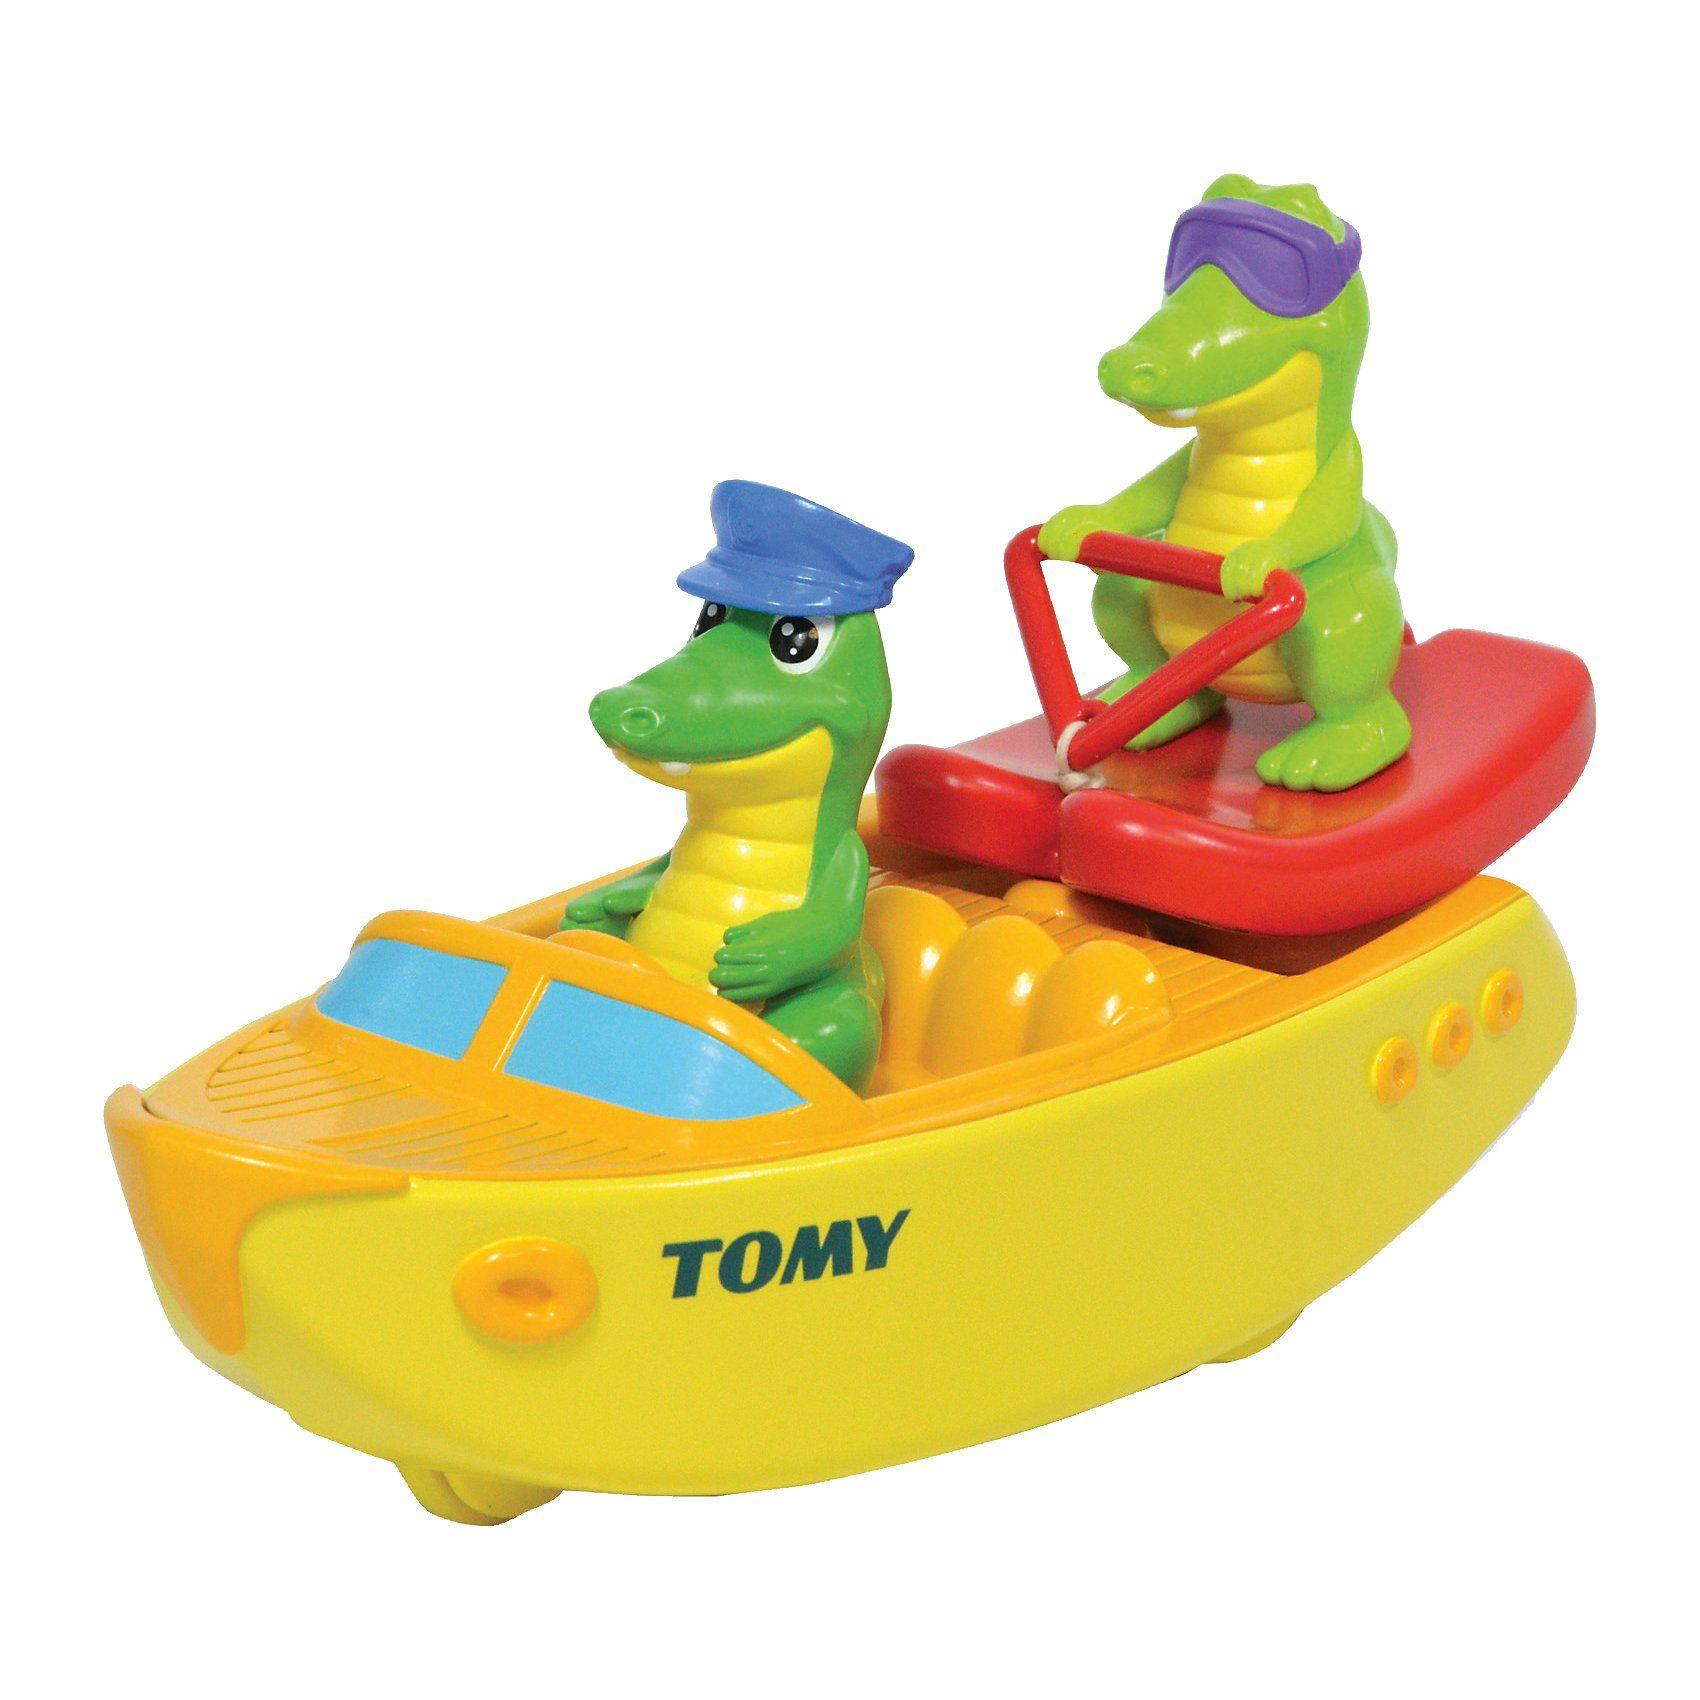 TOMY Badespielzeug - Ski Boot Krokos